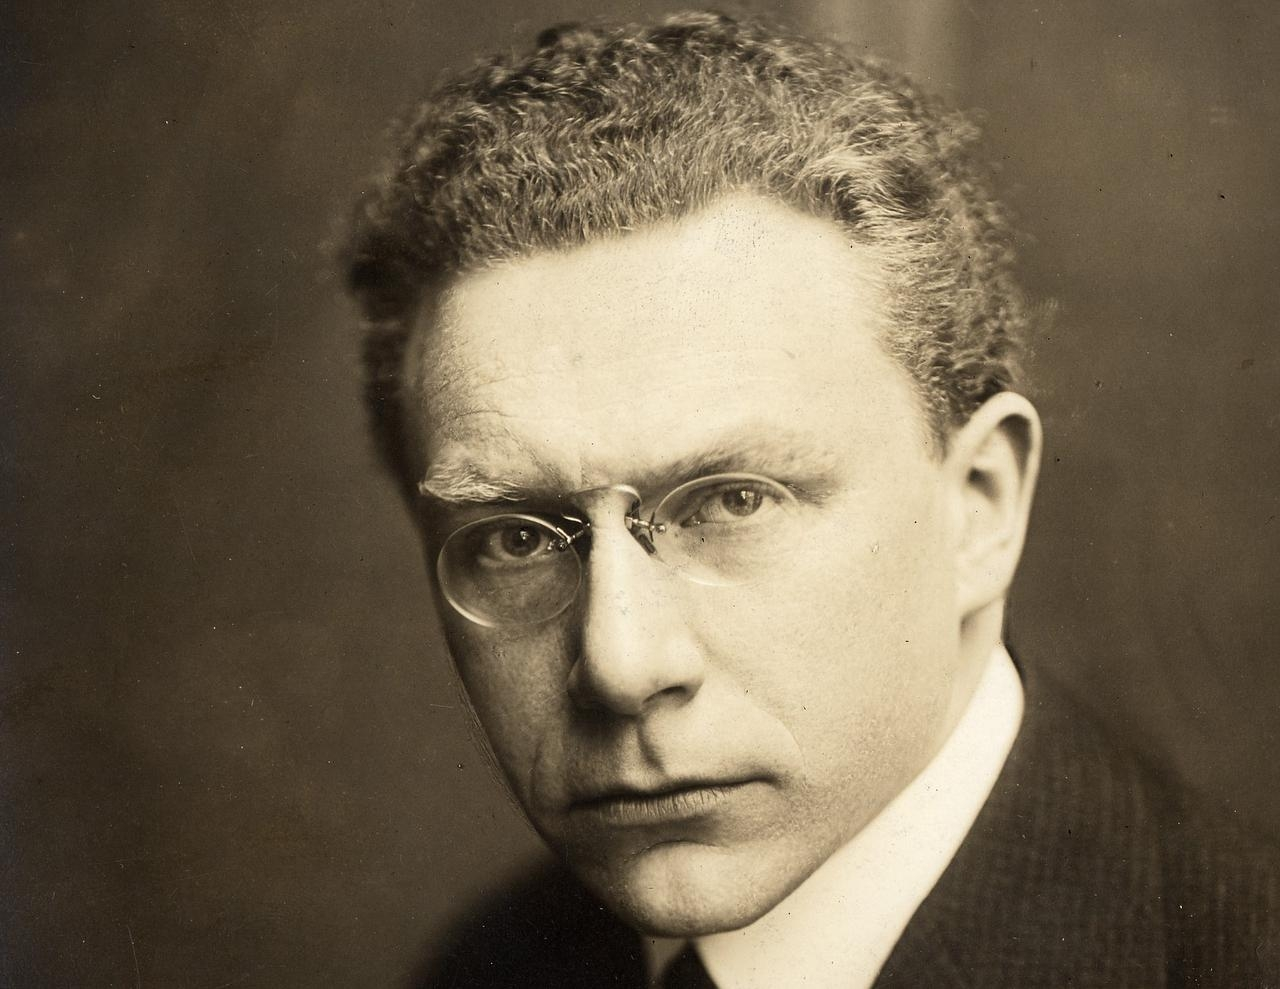 Biography of the forgotten Oscar-winning composer, pianist and Oscar winner from Liverton, Richard Hogman